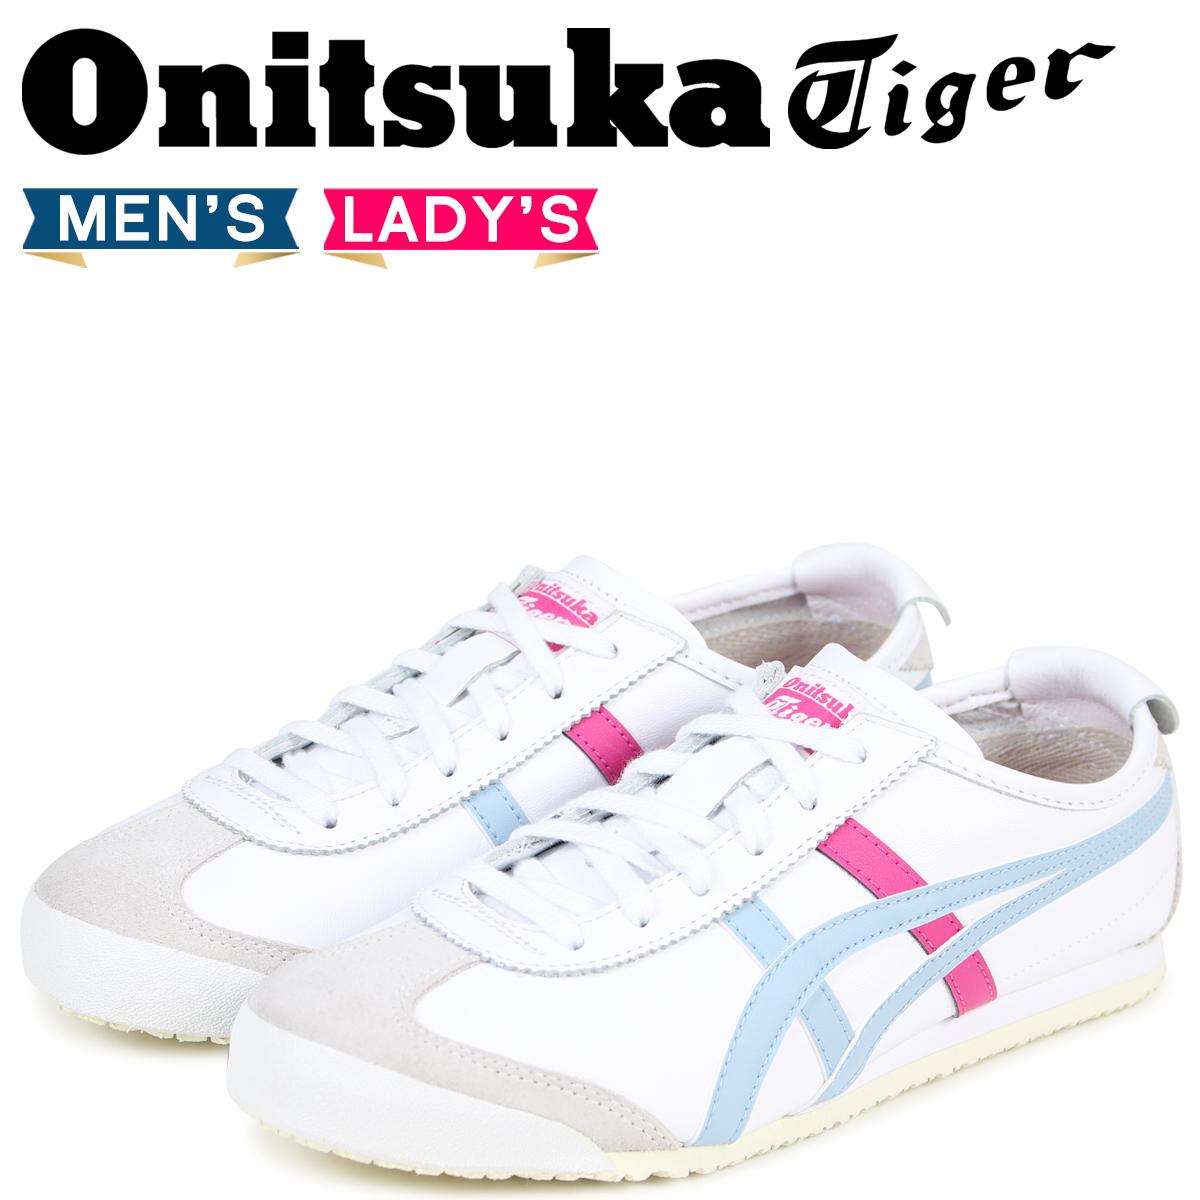 Onitsuka Tiger メキシコ 66 オニツカタイガー MEXICO 66 メンズ レディース スニーカー D4J2L-0140 TH4J2L-0140 ホワイト 【決算セール 返品不可】